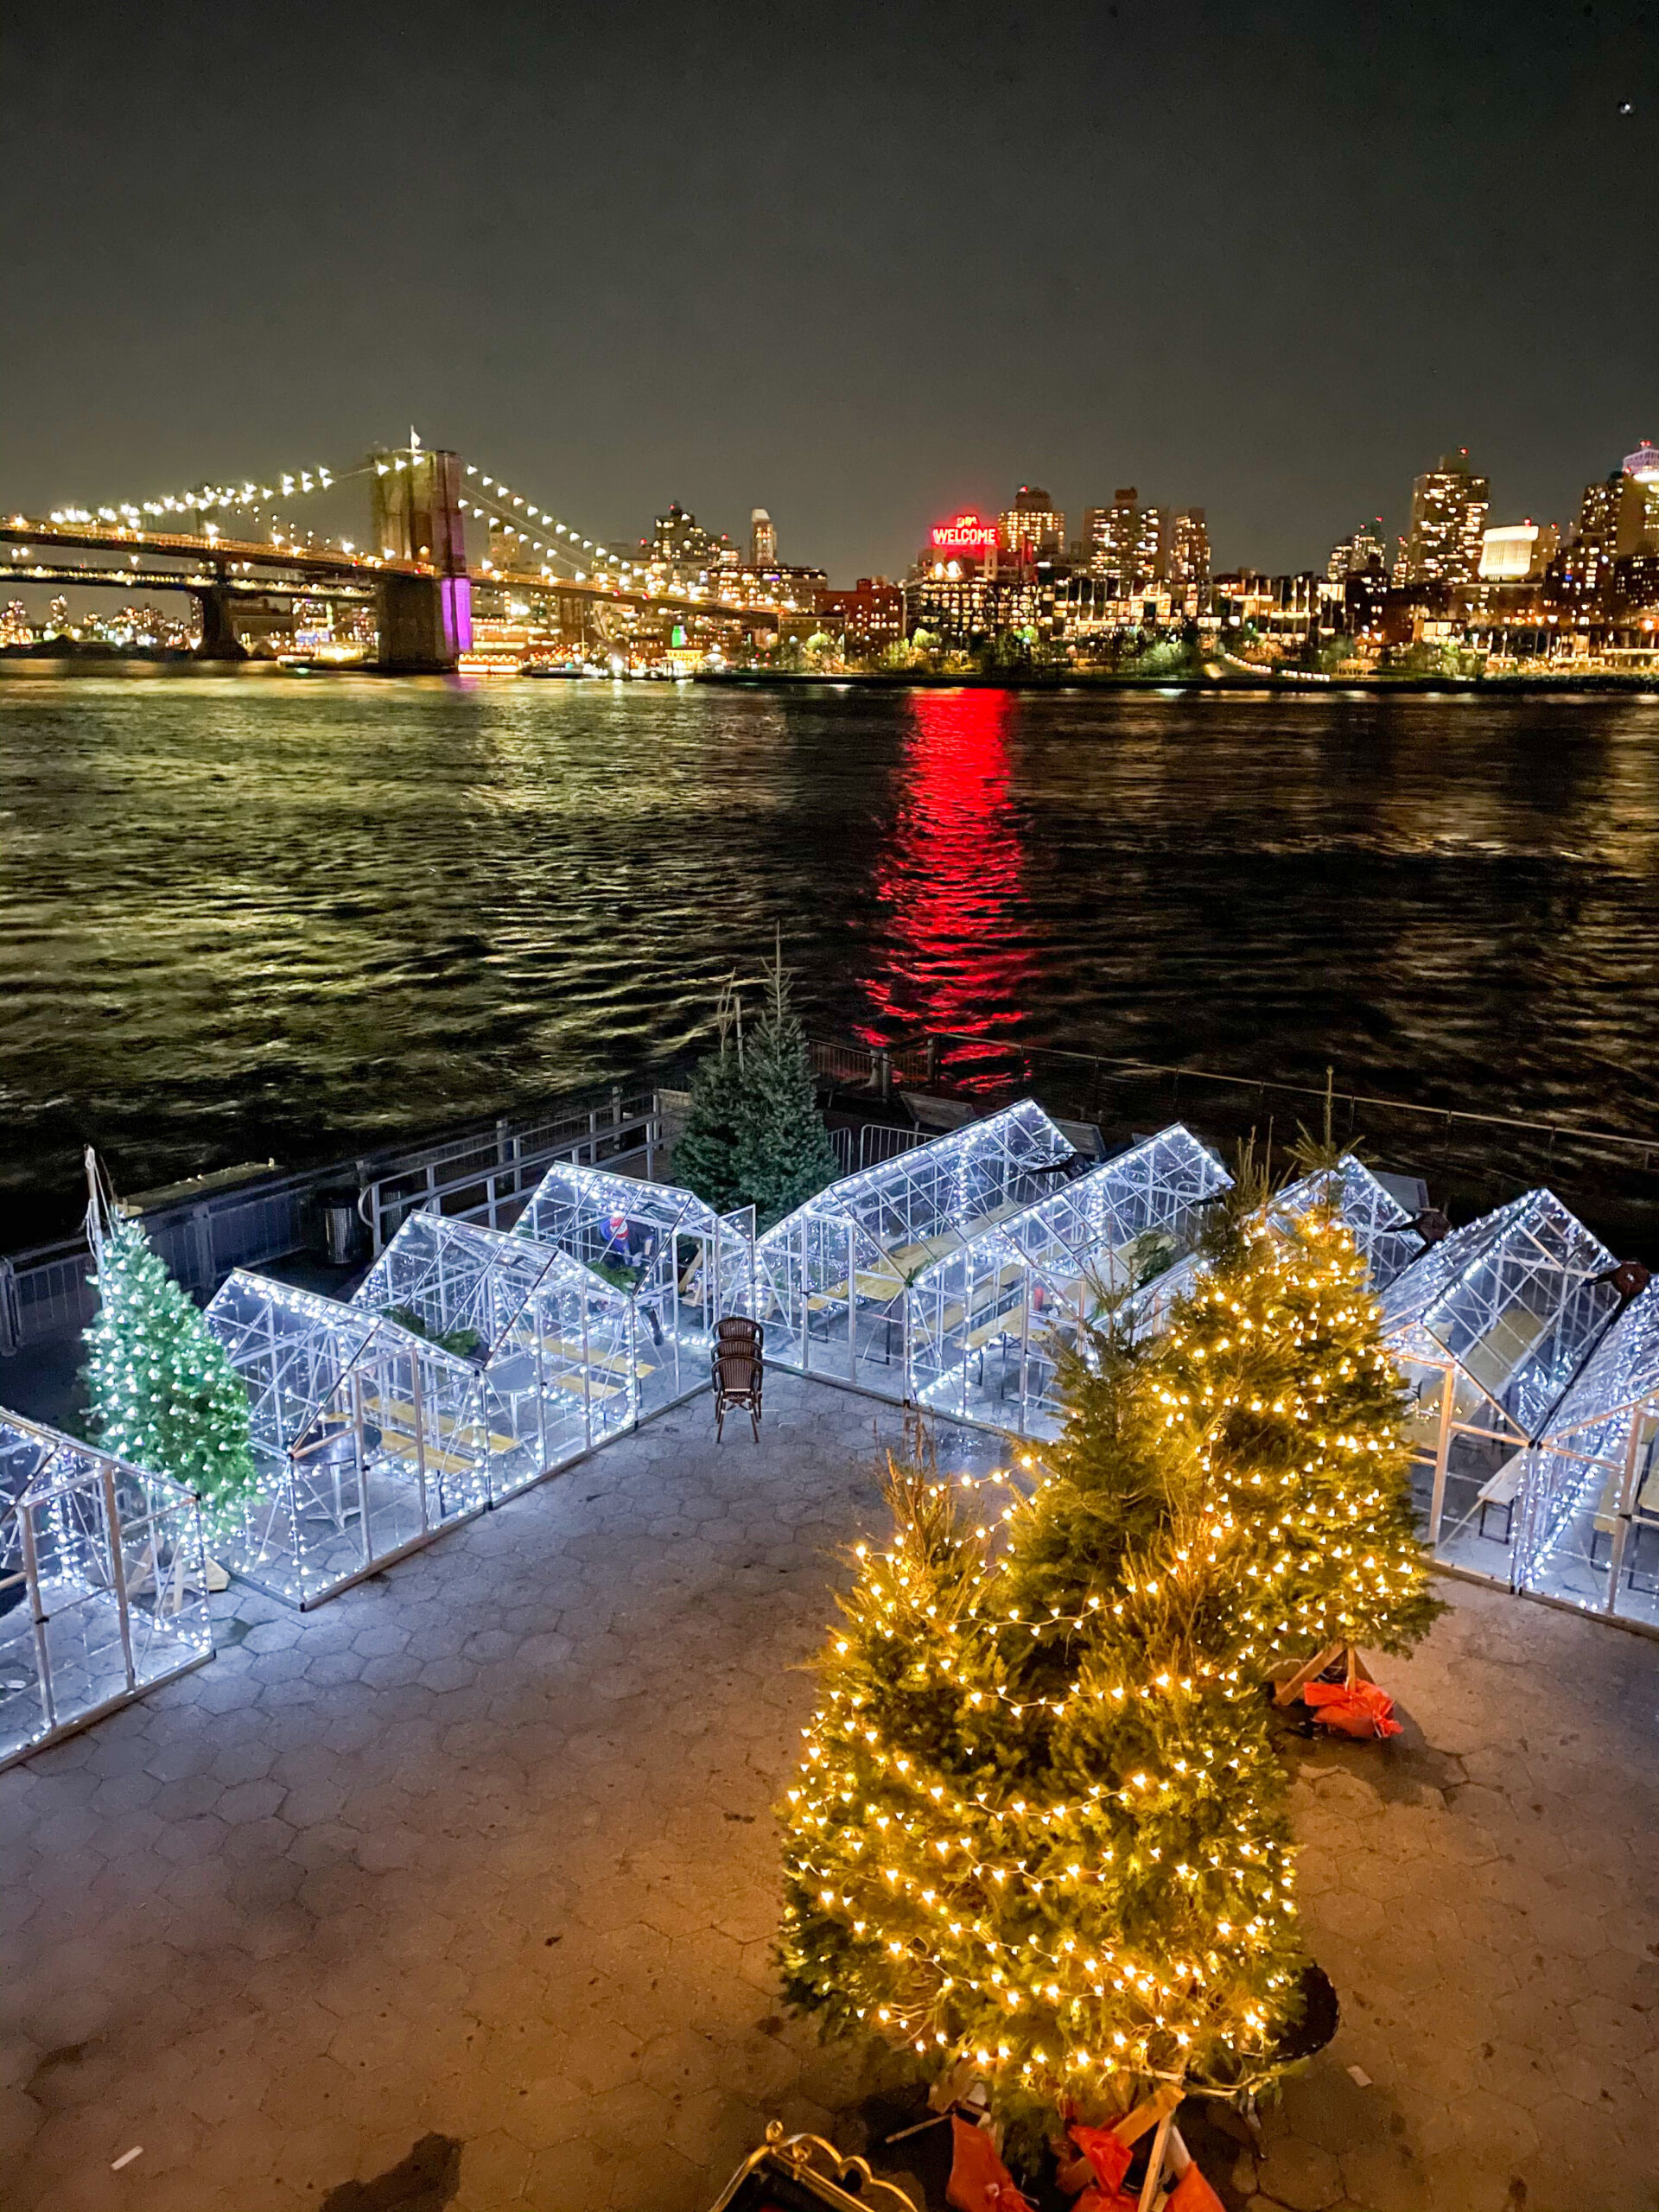 Natale a New York, Pier 15